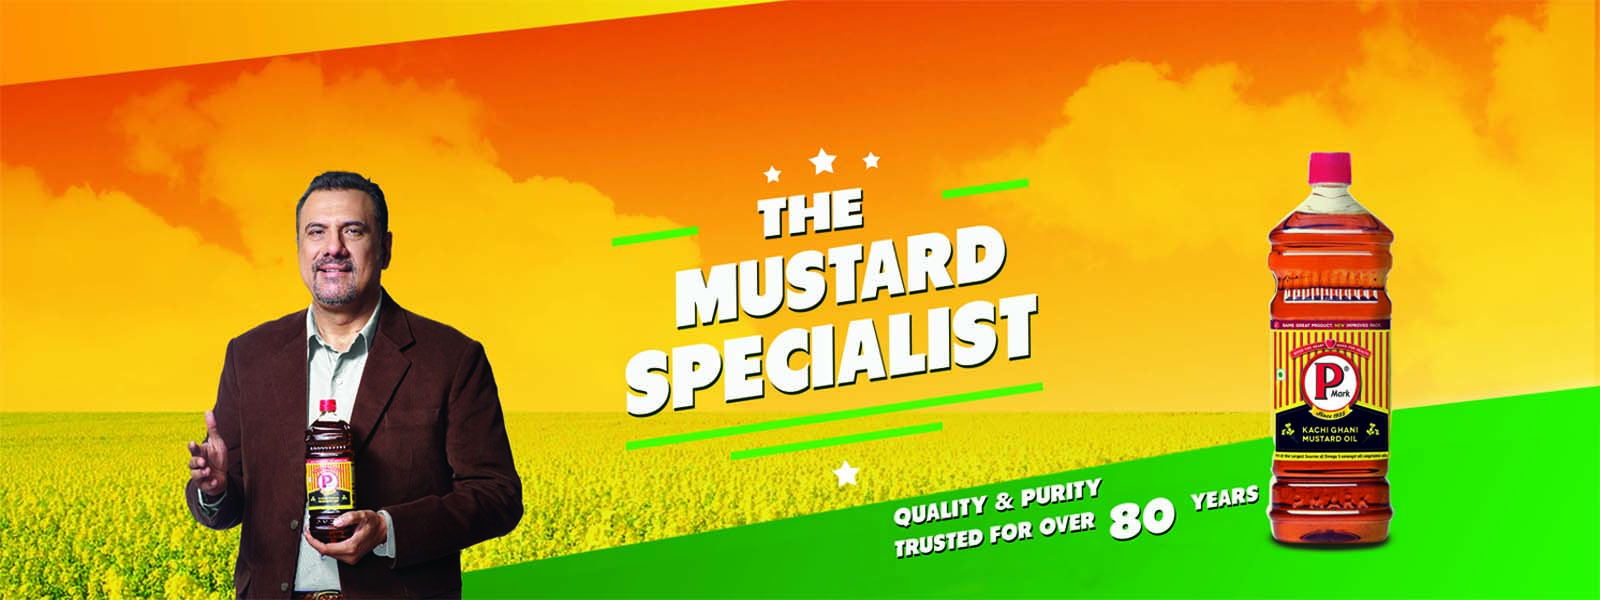 The Mustard Specialist